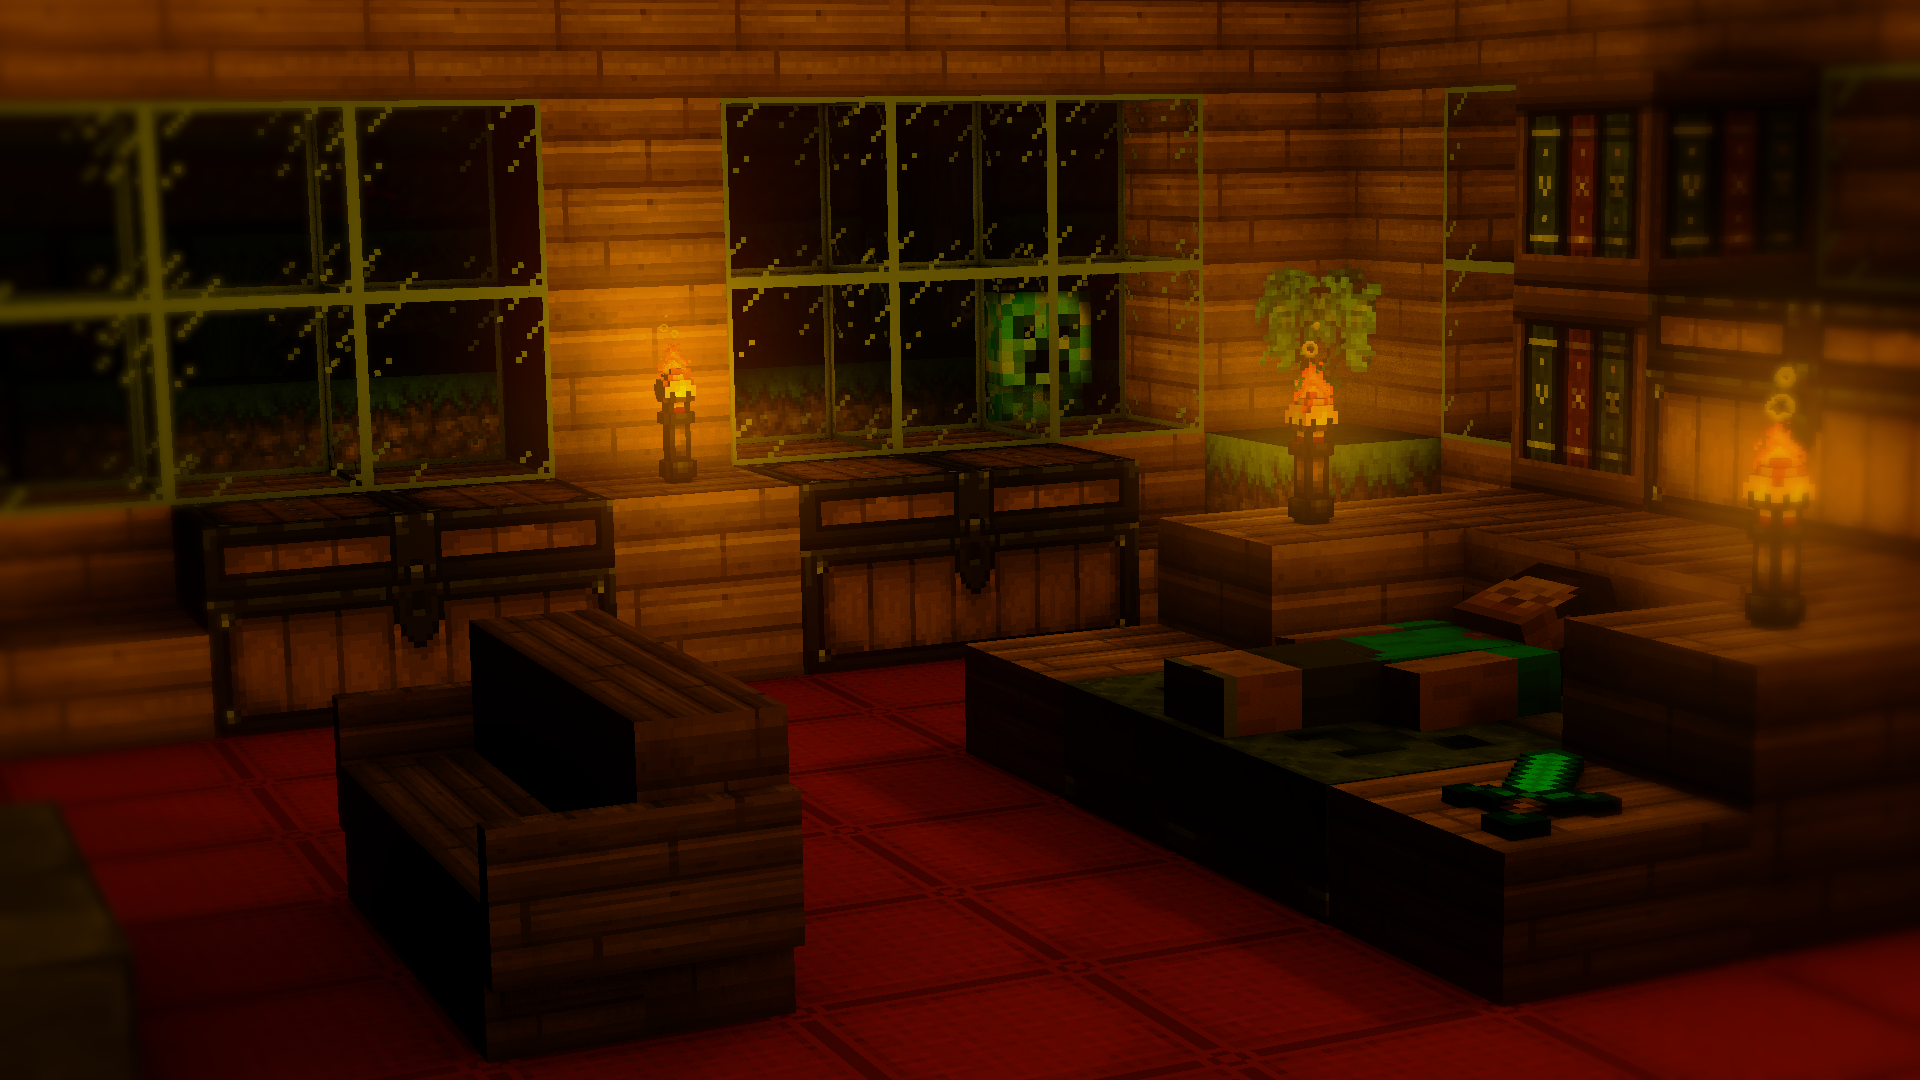 Minecraft 3D Room By TheEvOlLuTiOnS On DeviantArt